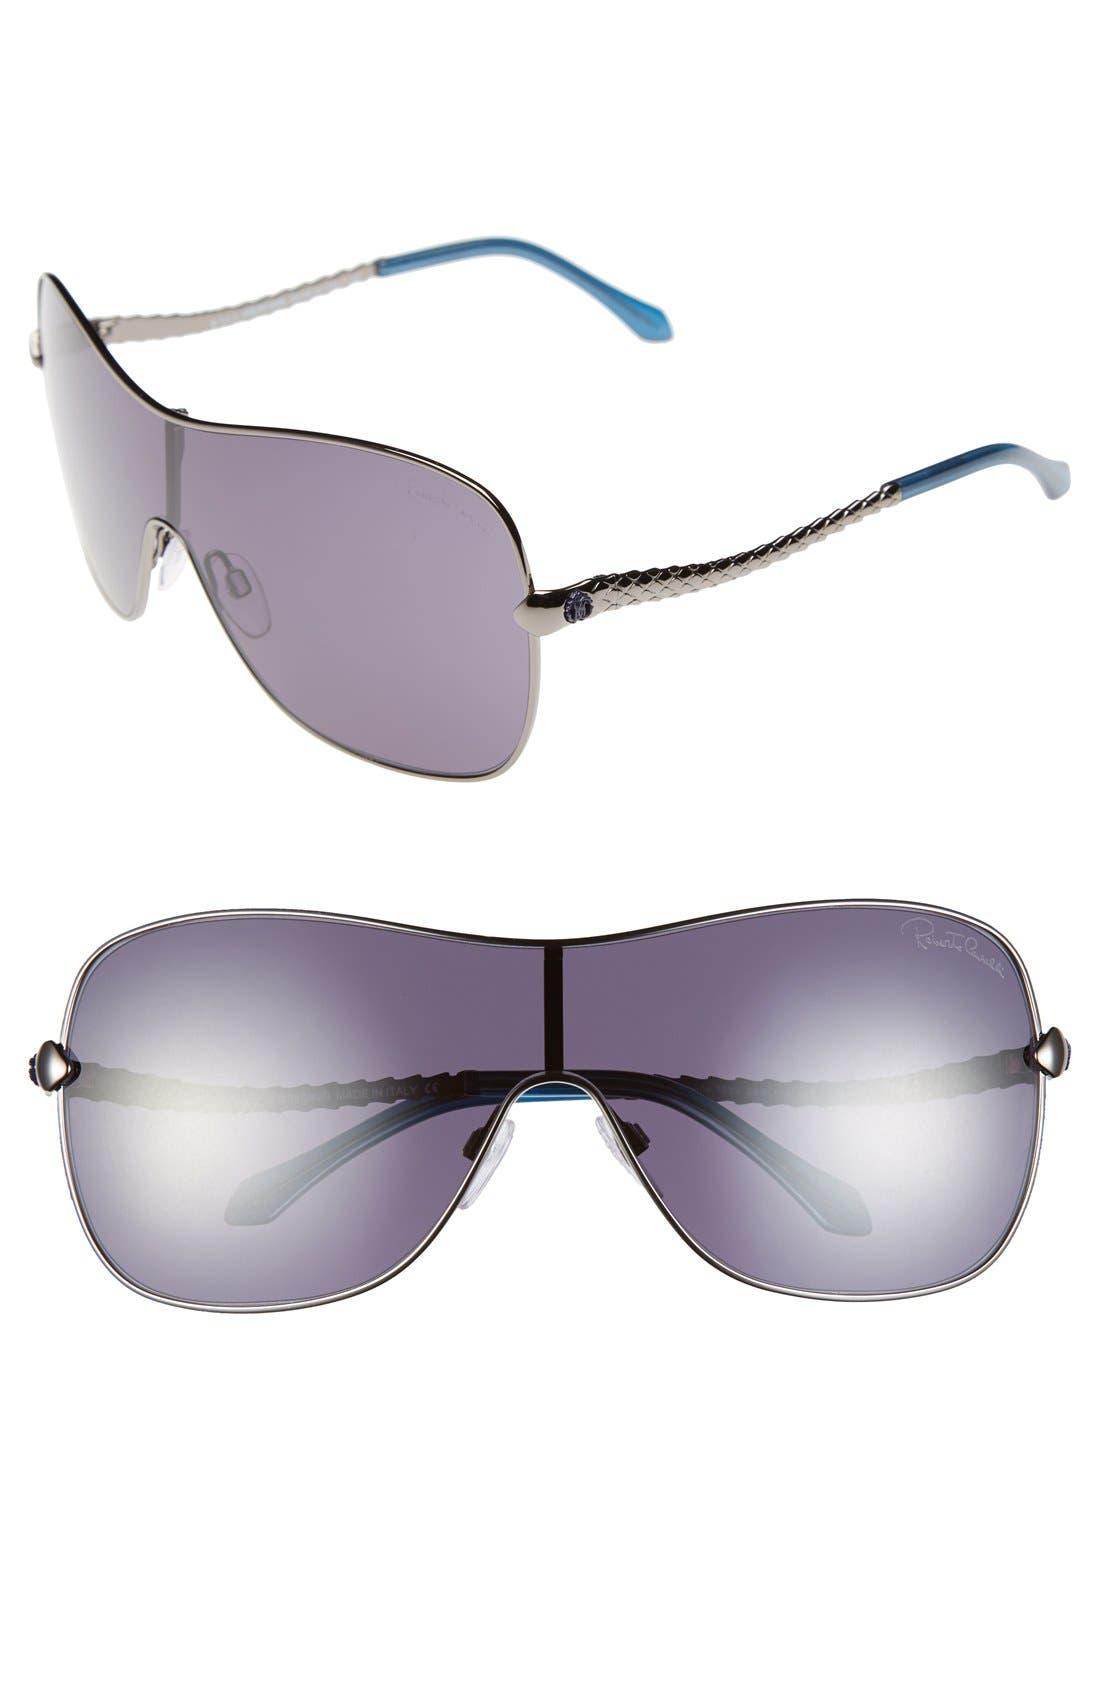 Alternate Image 1 Selected - Roberto Cavalli 'Agena' Shield Sunglasses